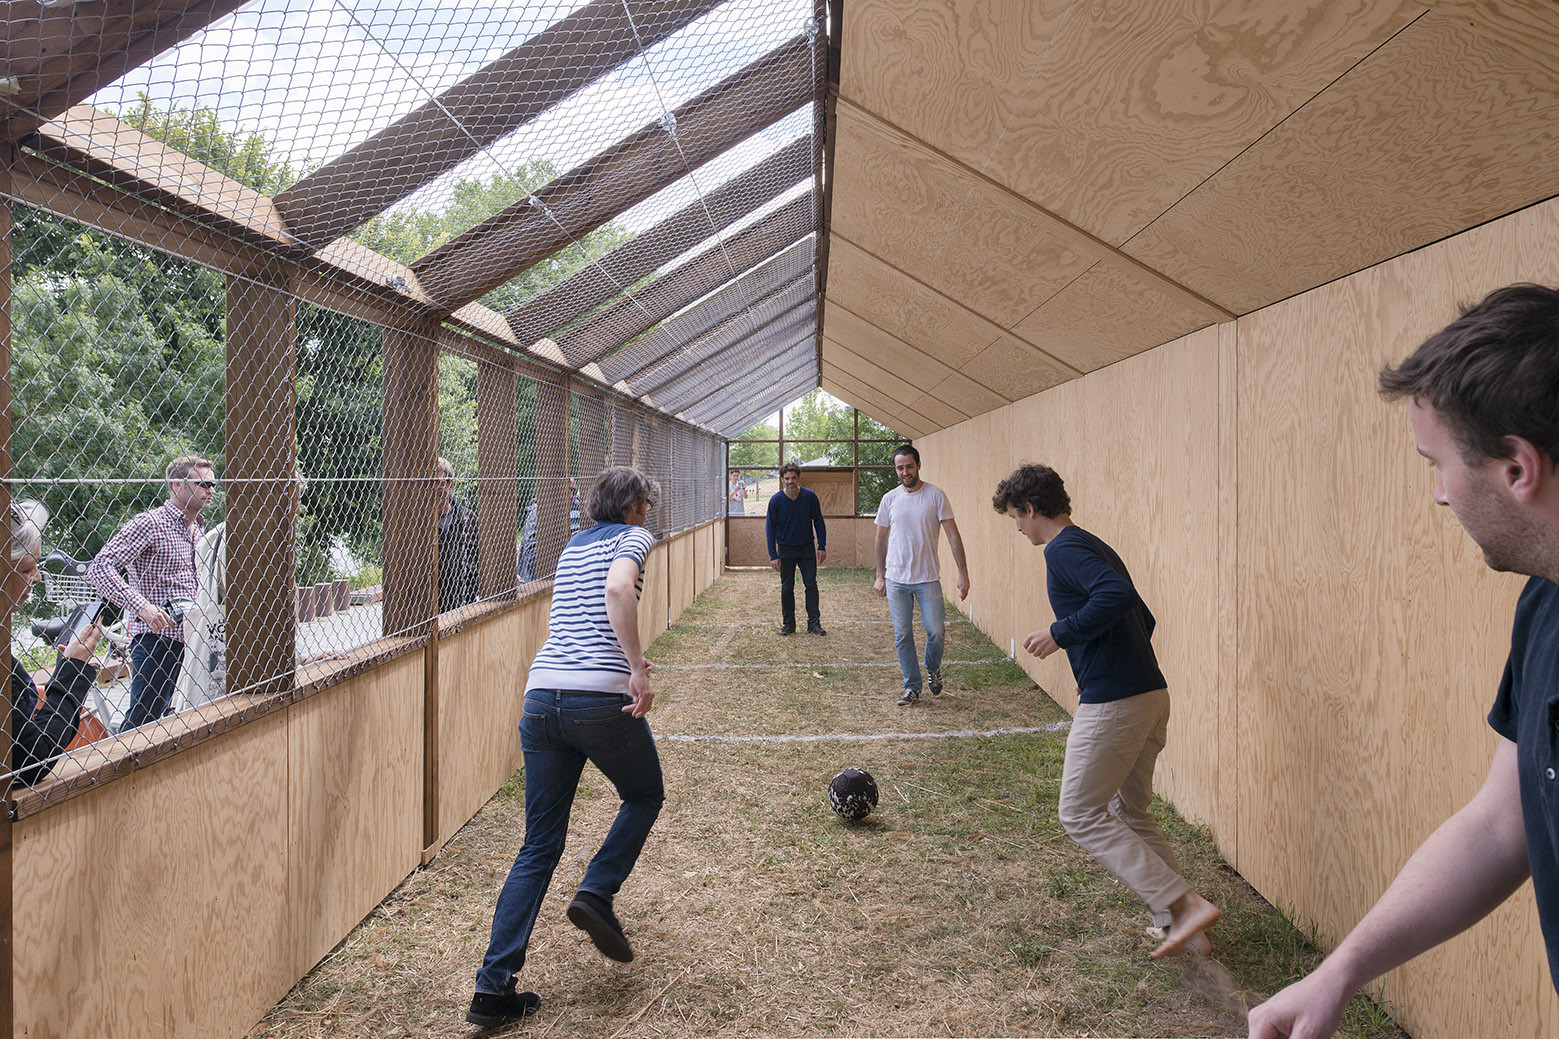 Football Playground / Guinée et Potin Architects, © Martin Argyroglo